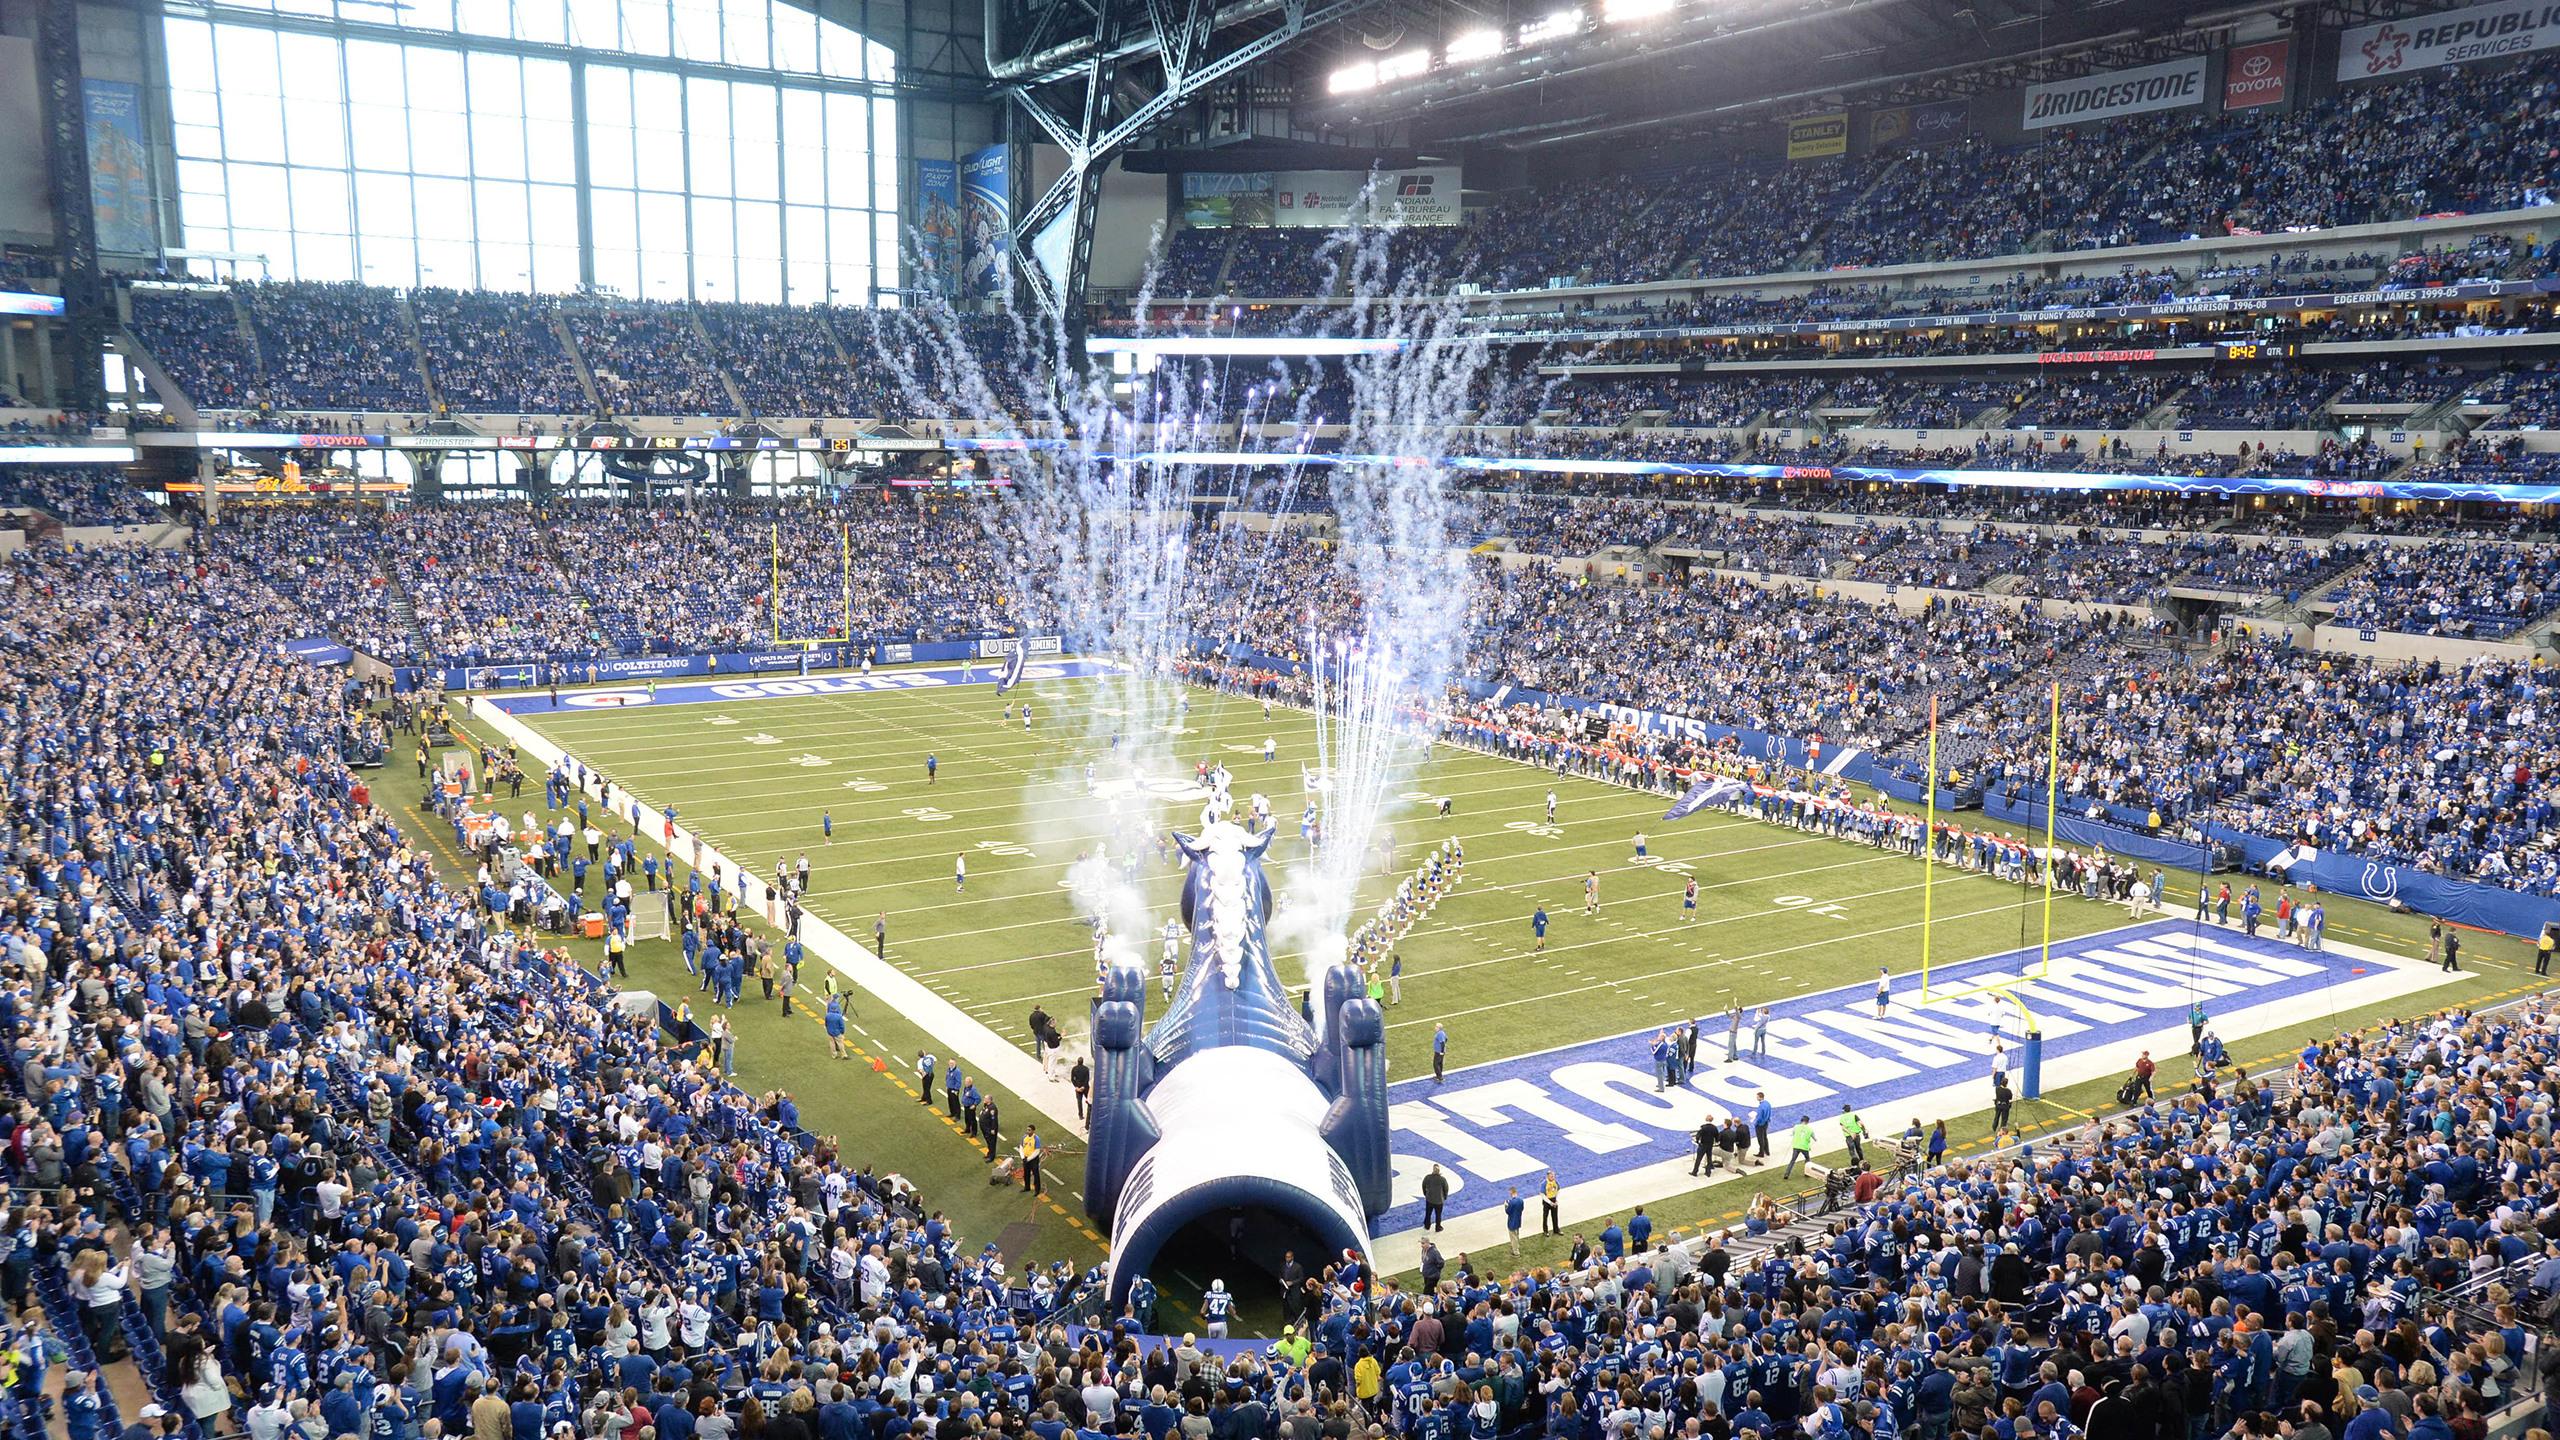 Colts vs. Ravens, August 20th